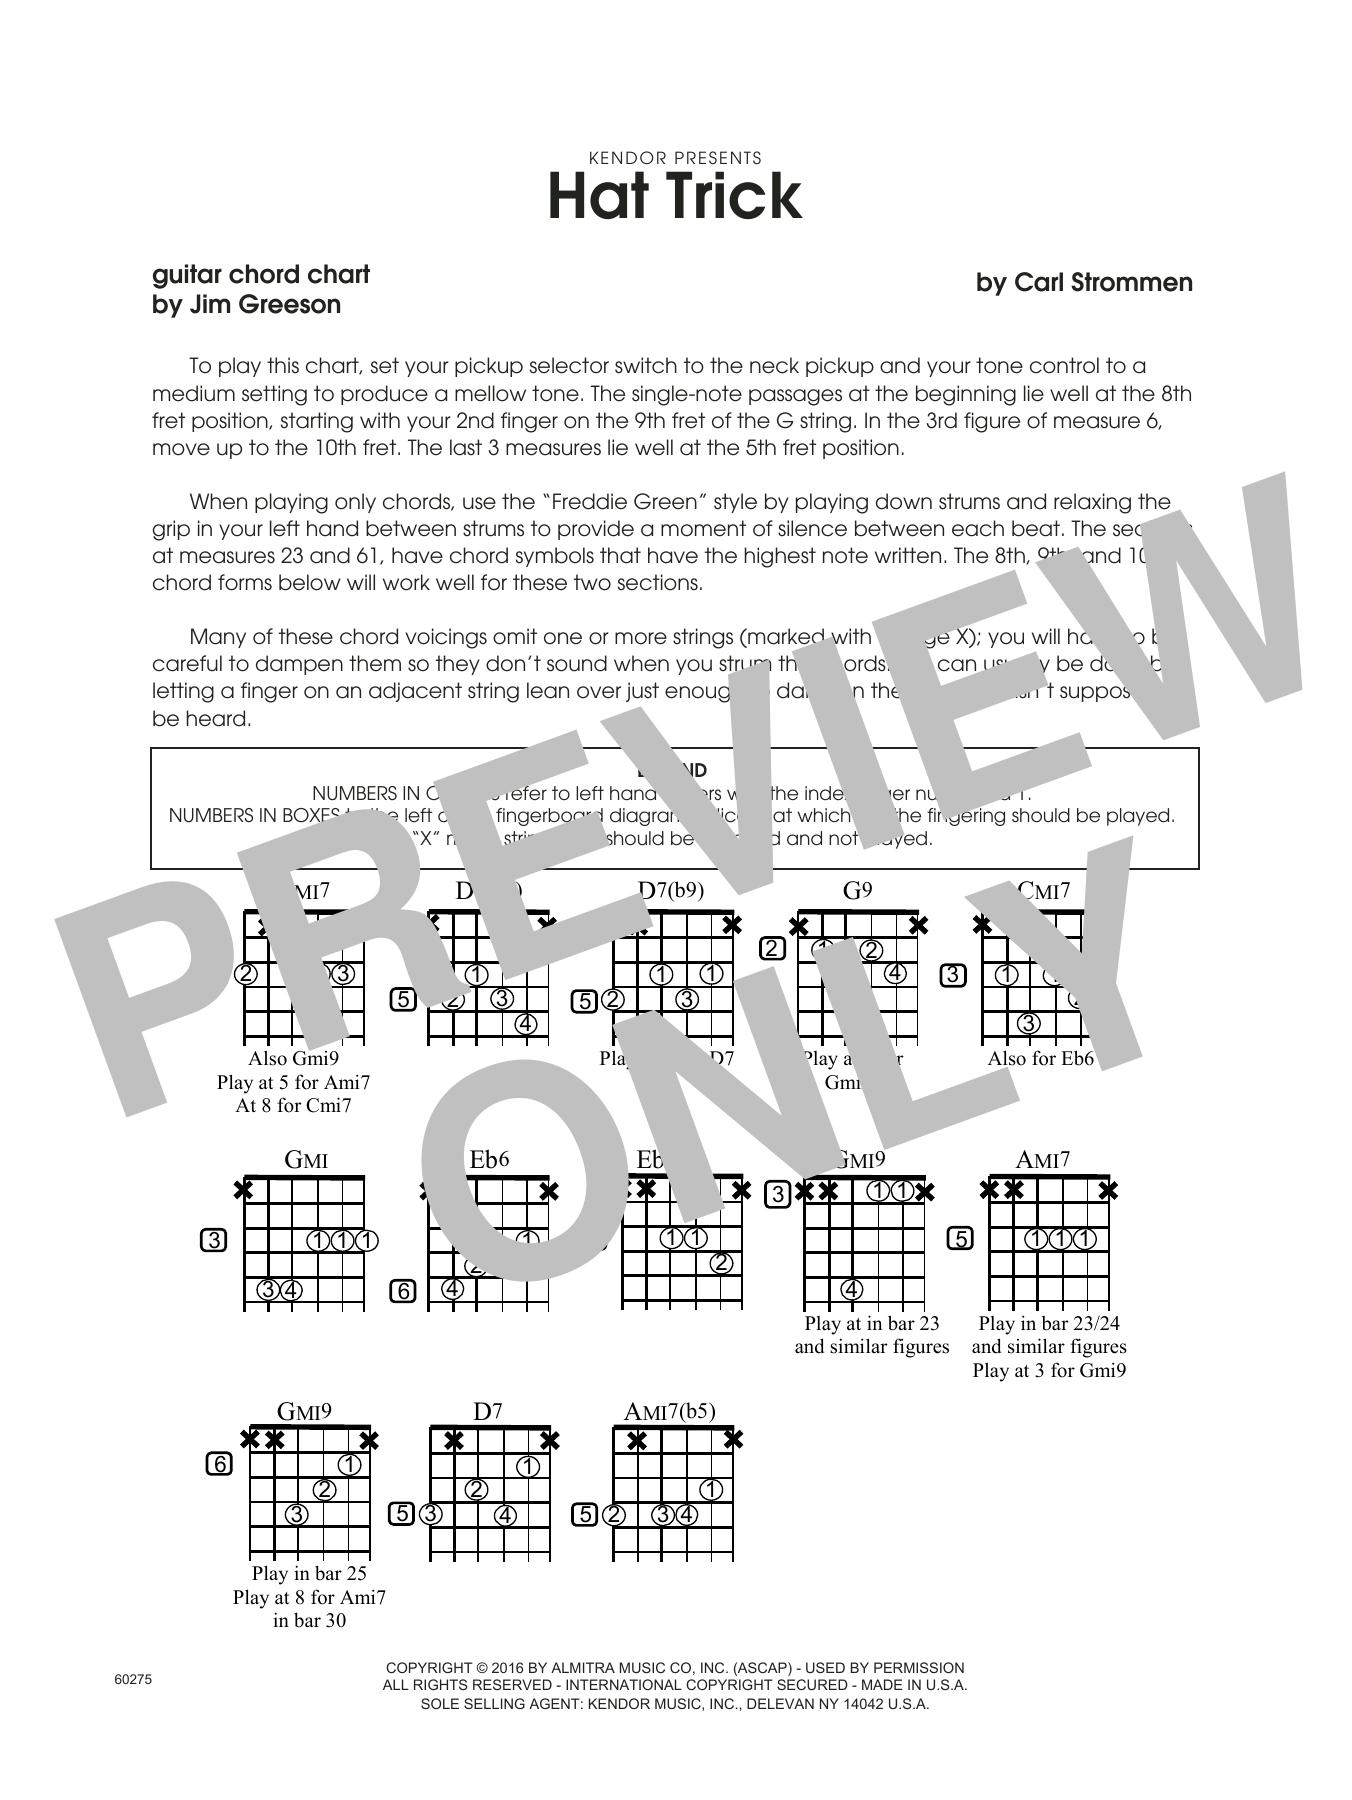 Hat Trick - Guitar Chord Chart Sheet Music